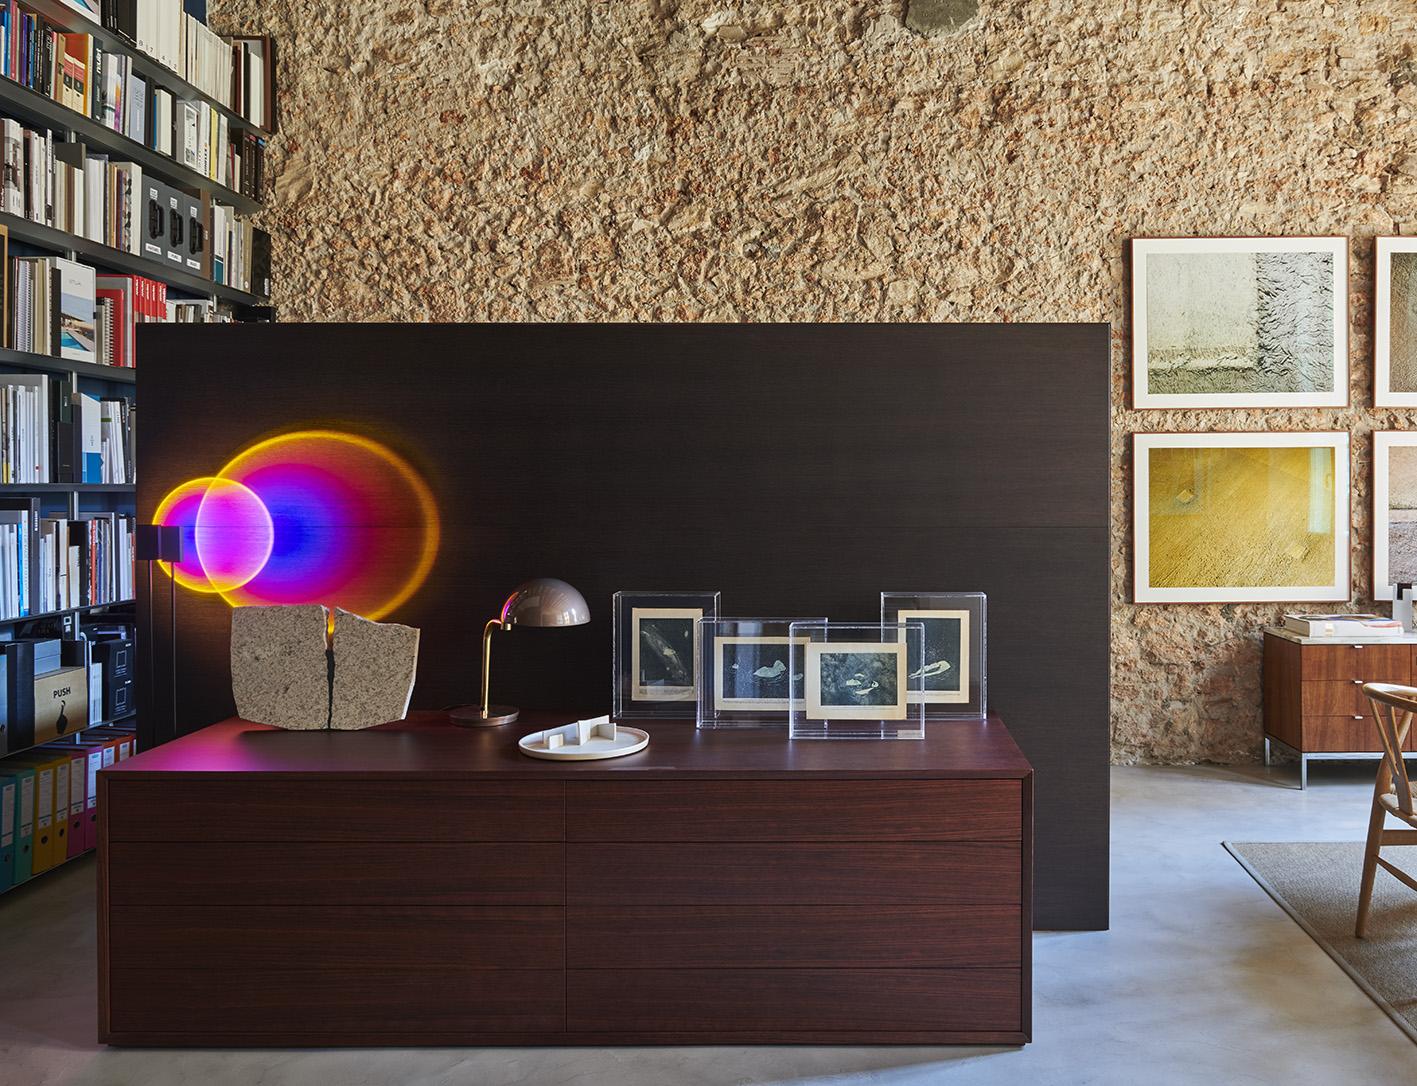 rardo-architects-sitges-barcelona-office-iii